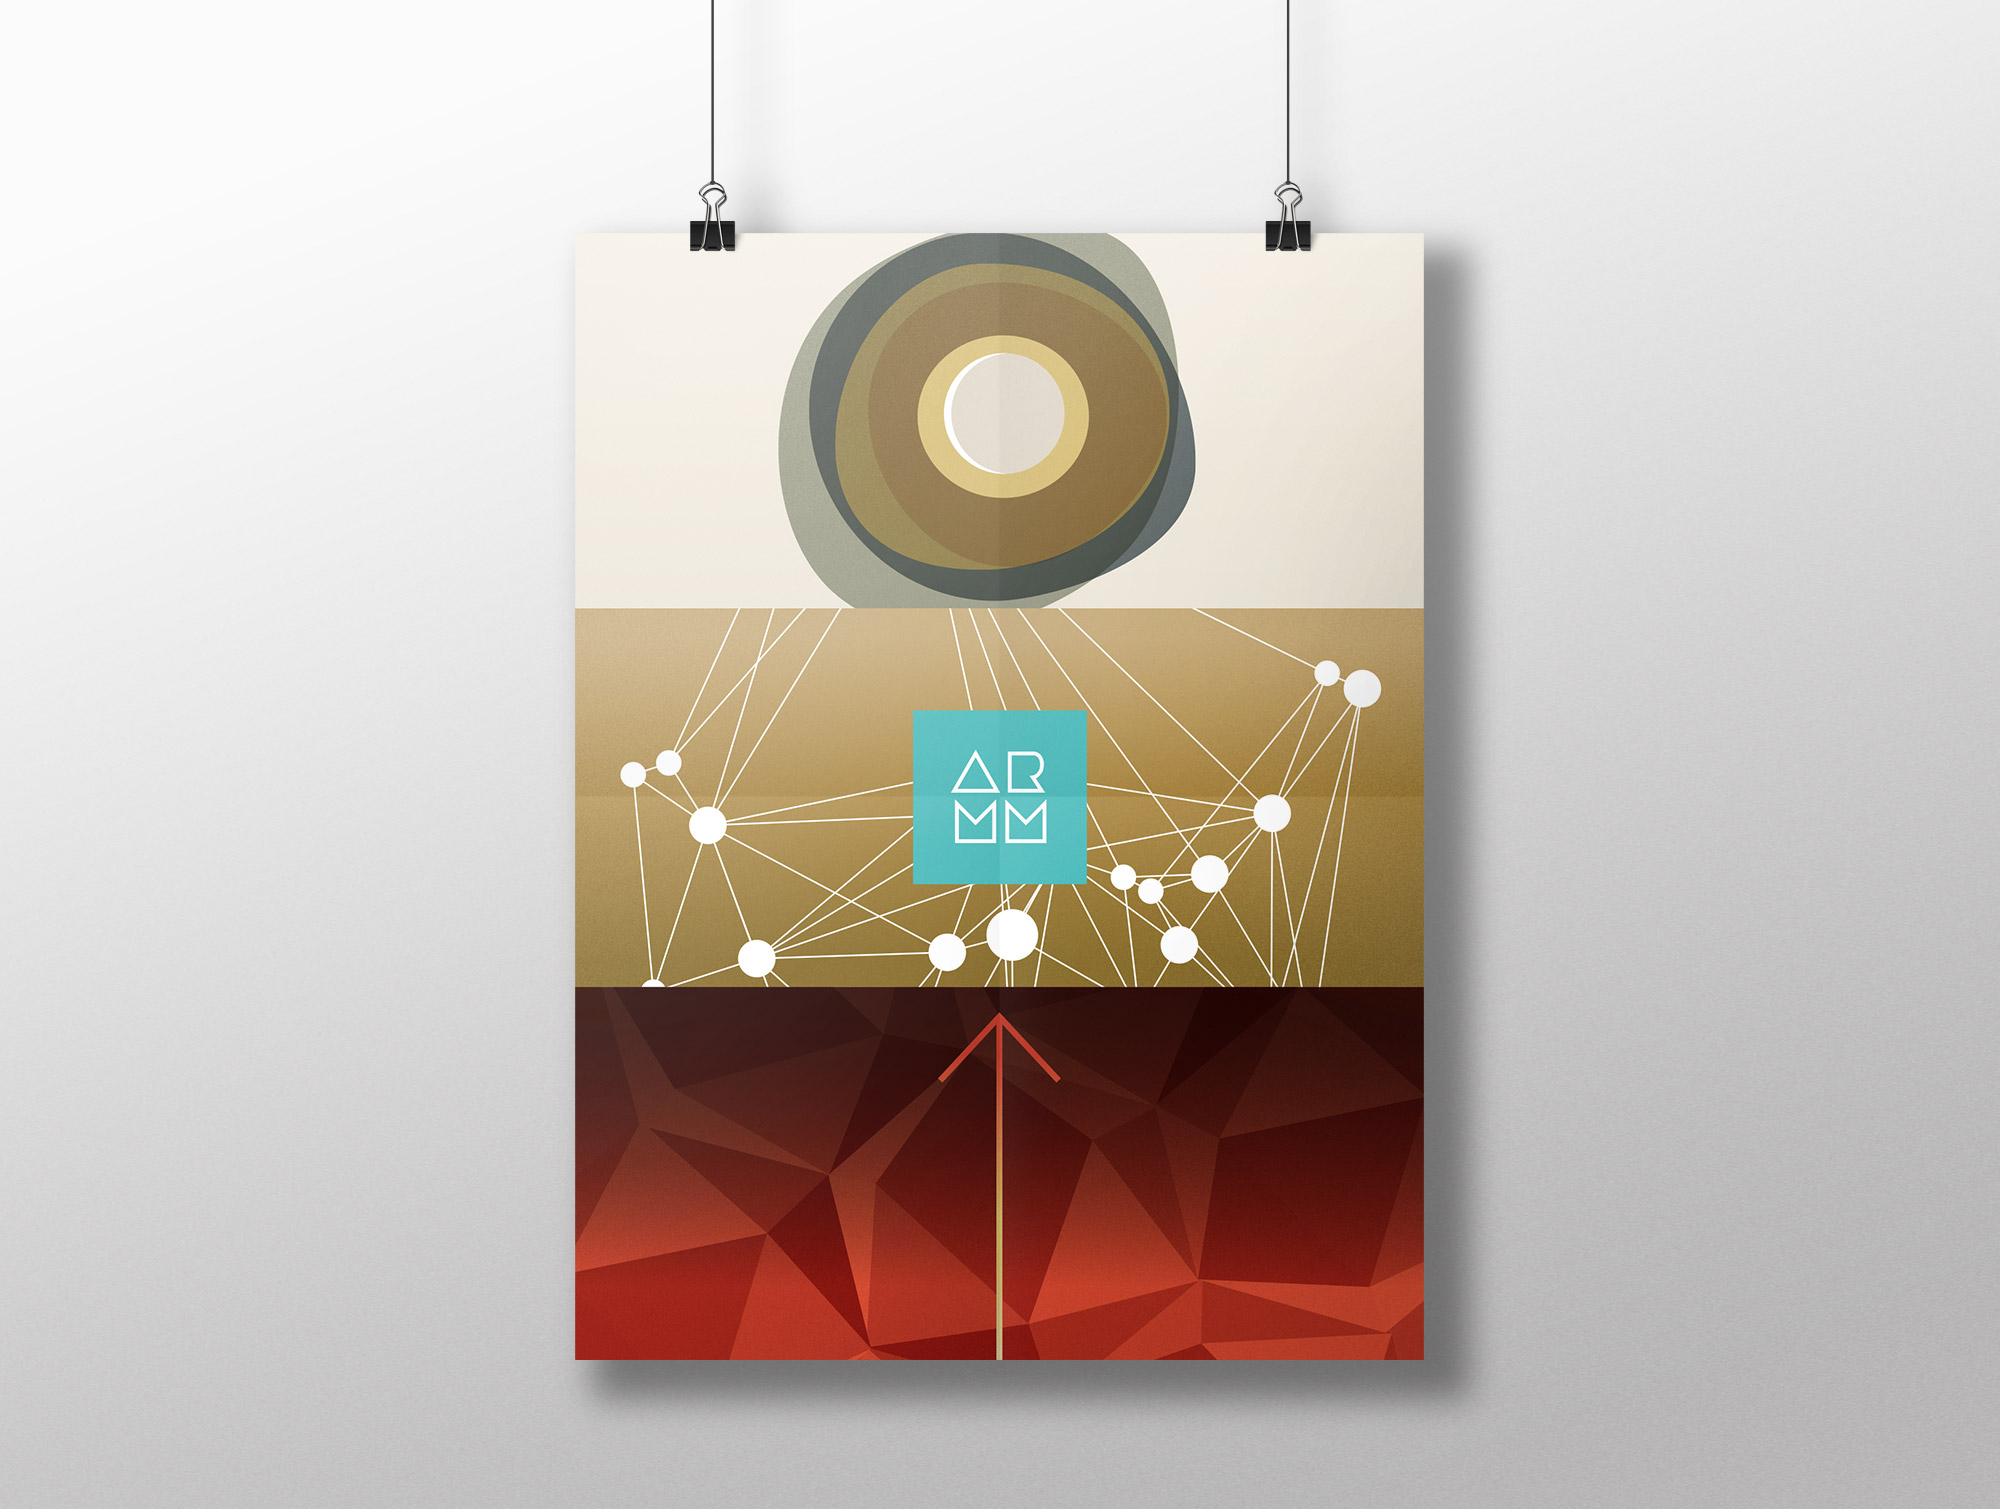 ARMM-Poster